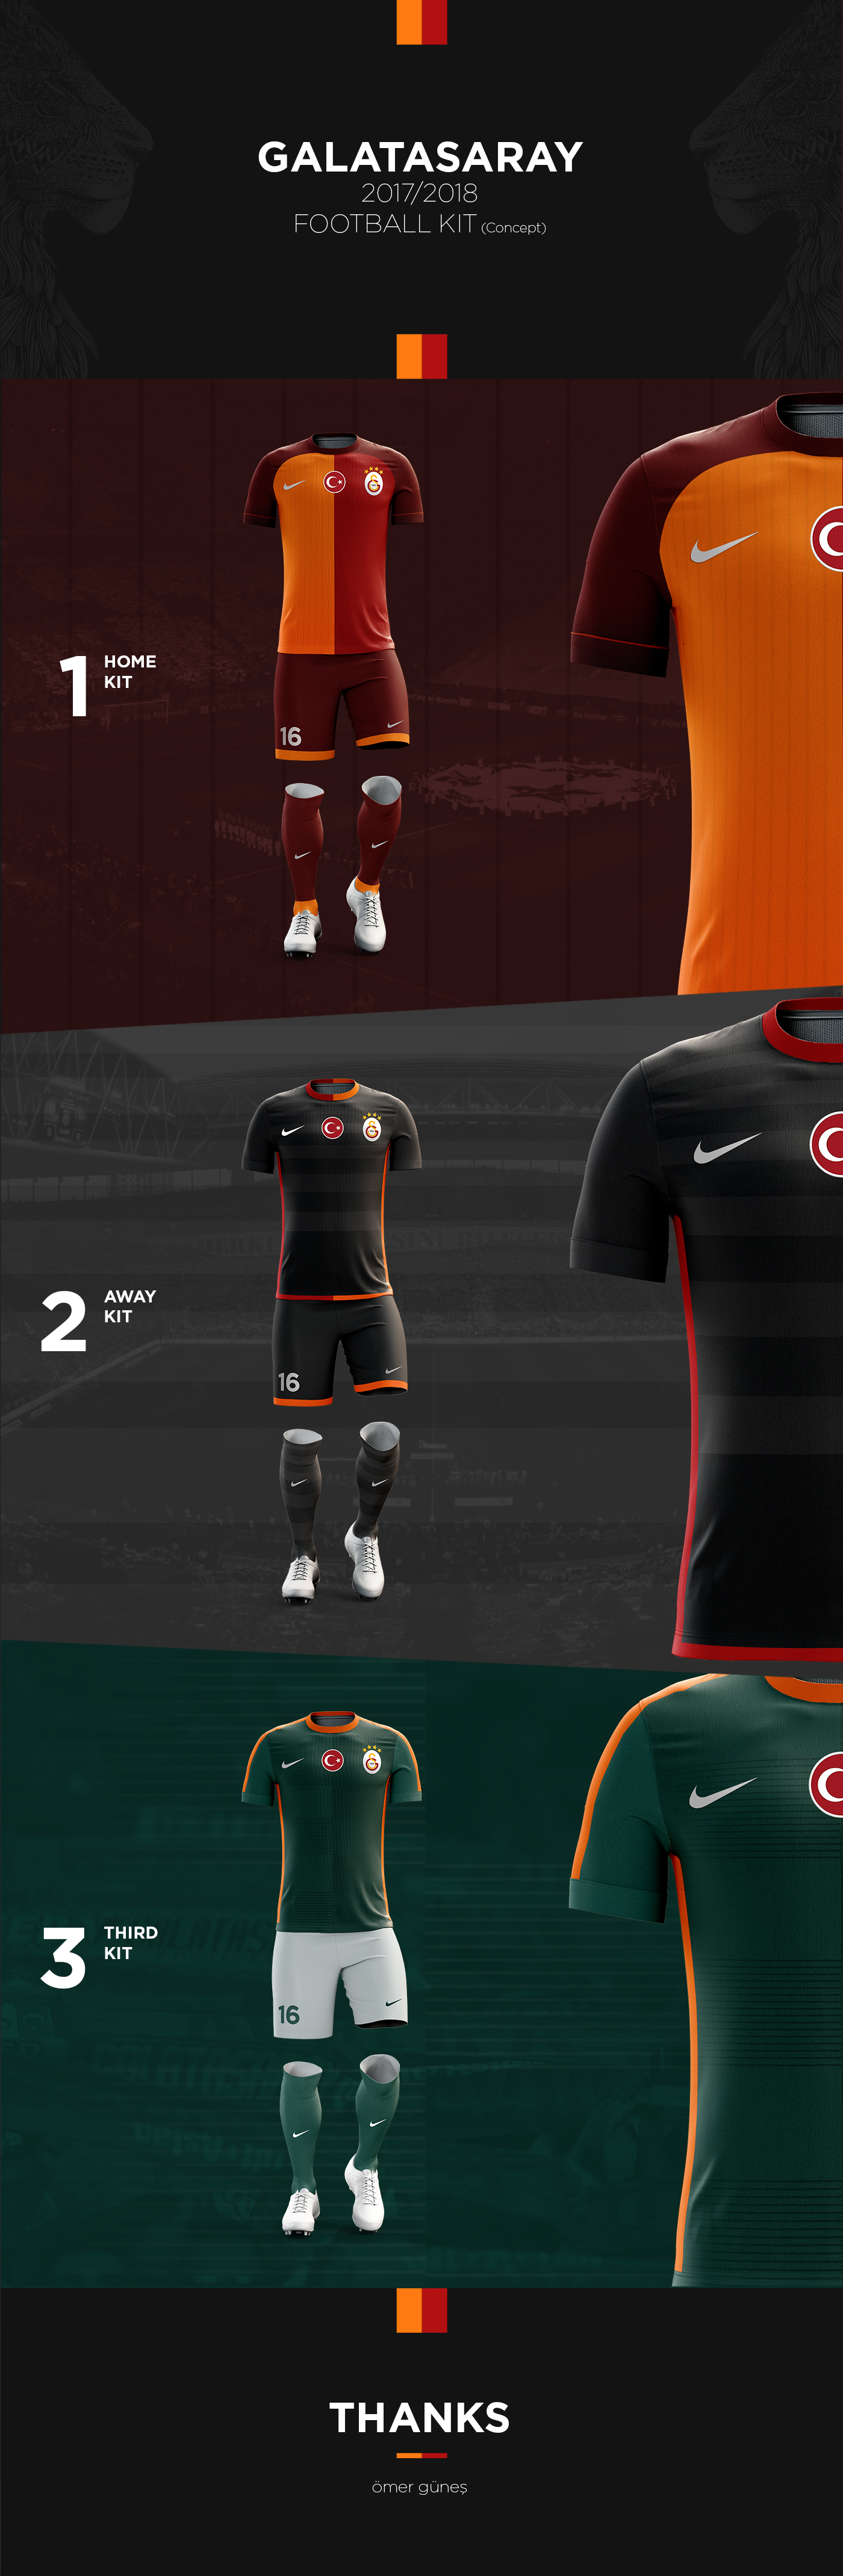 Galatasaray 2017-2018 Football Kit (Concept Design) on Behance ... b00cae2d4e39a